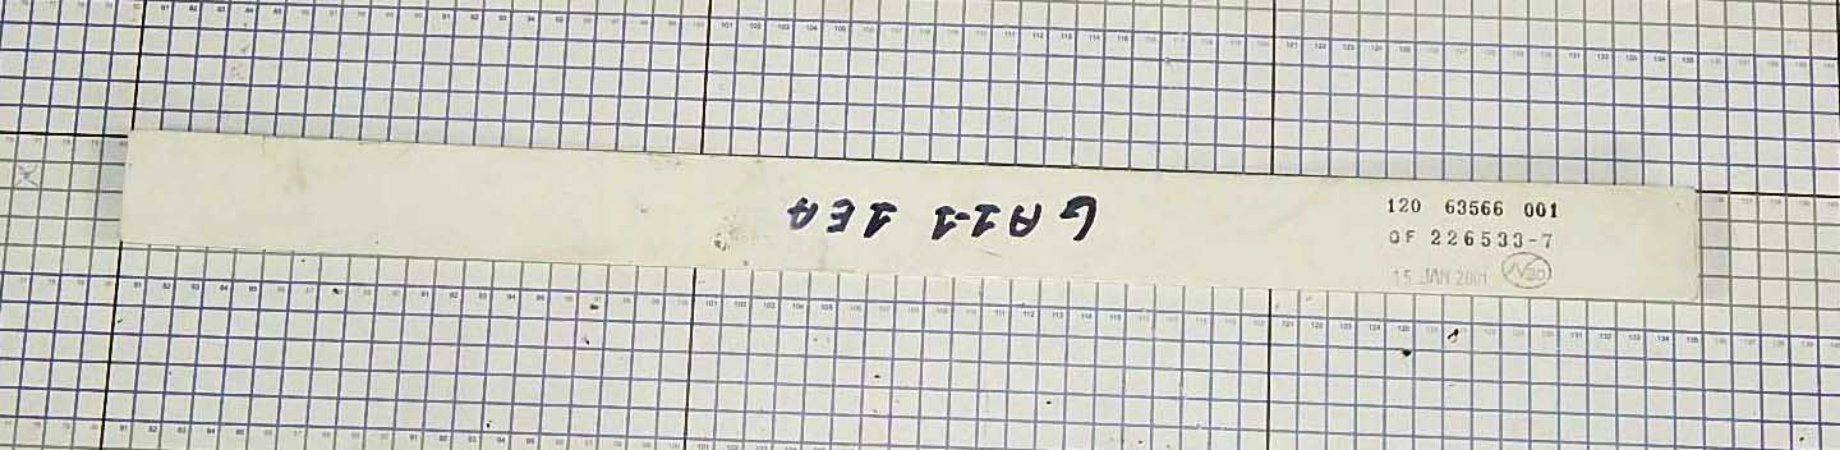 120-63566-001